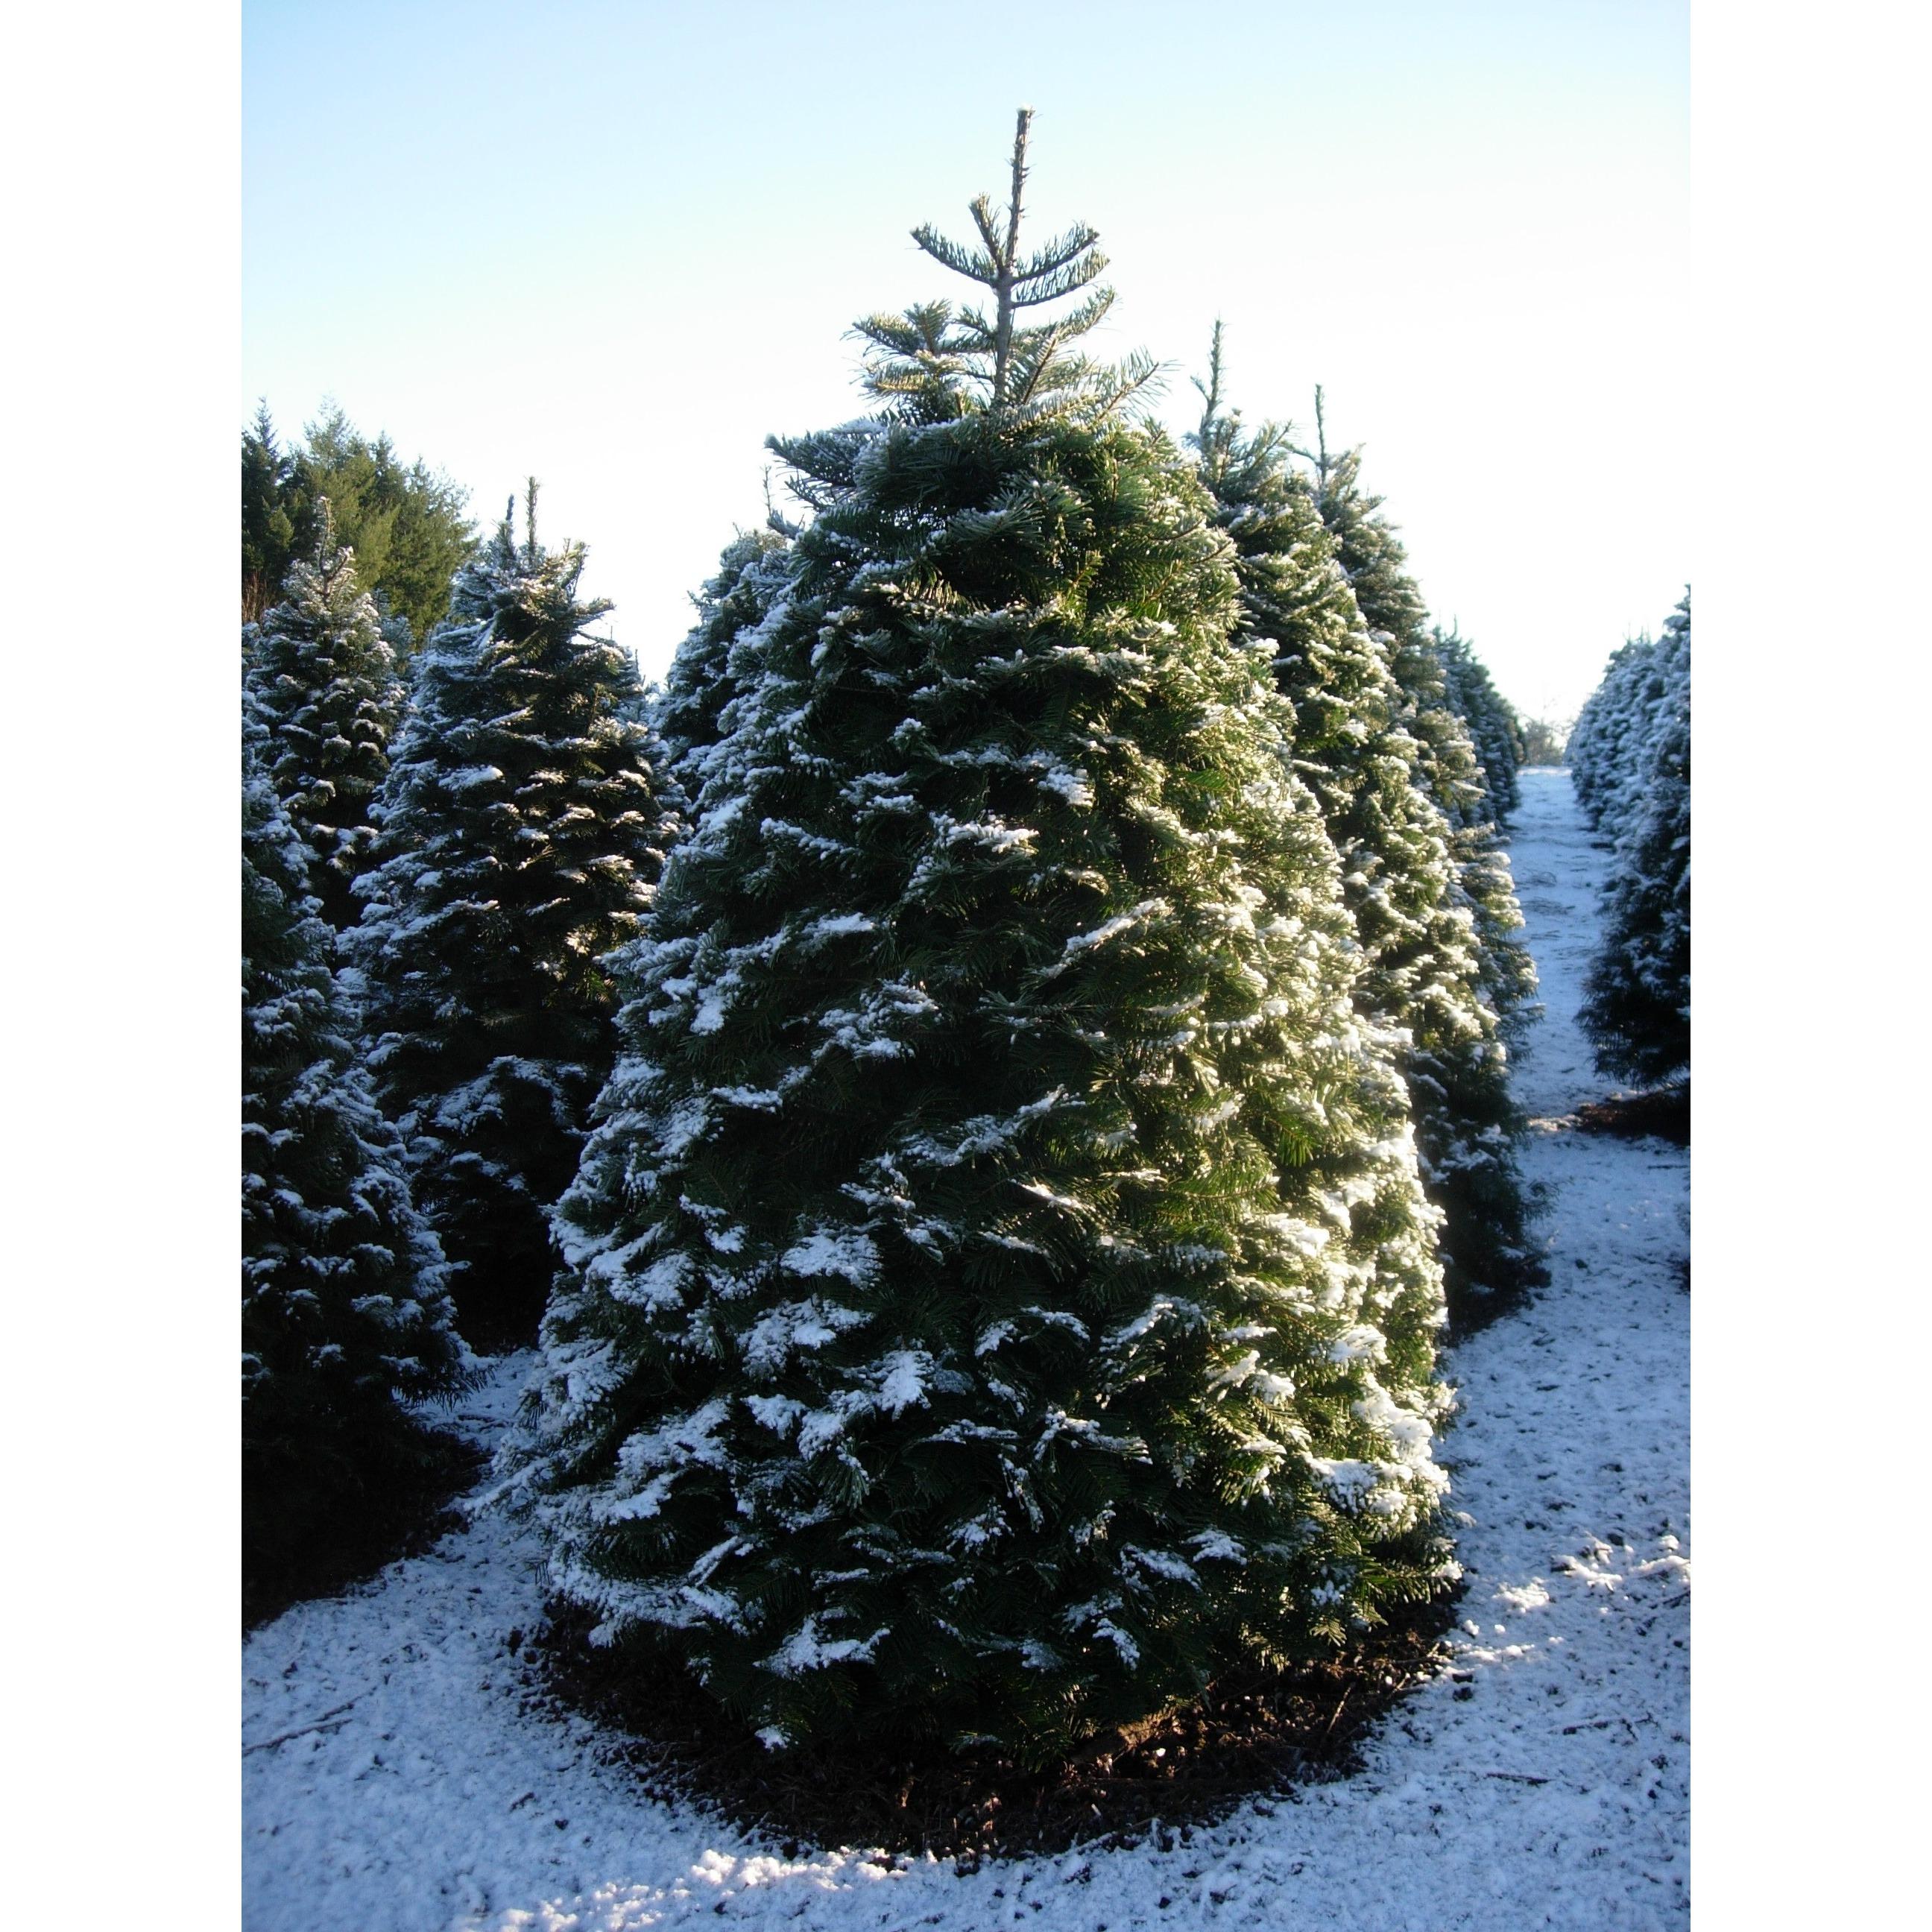 Crossties Tree Farm LLC image 5